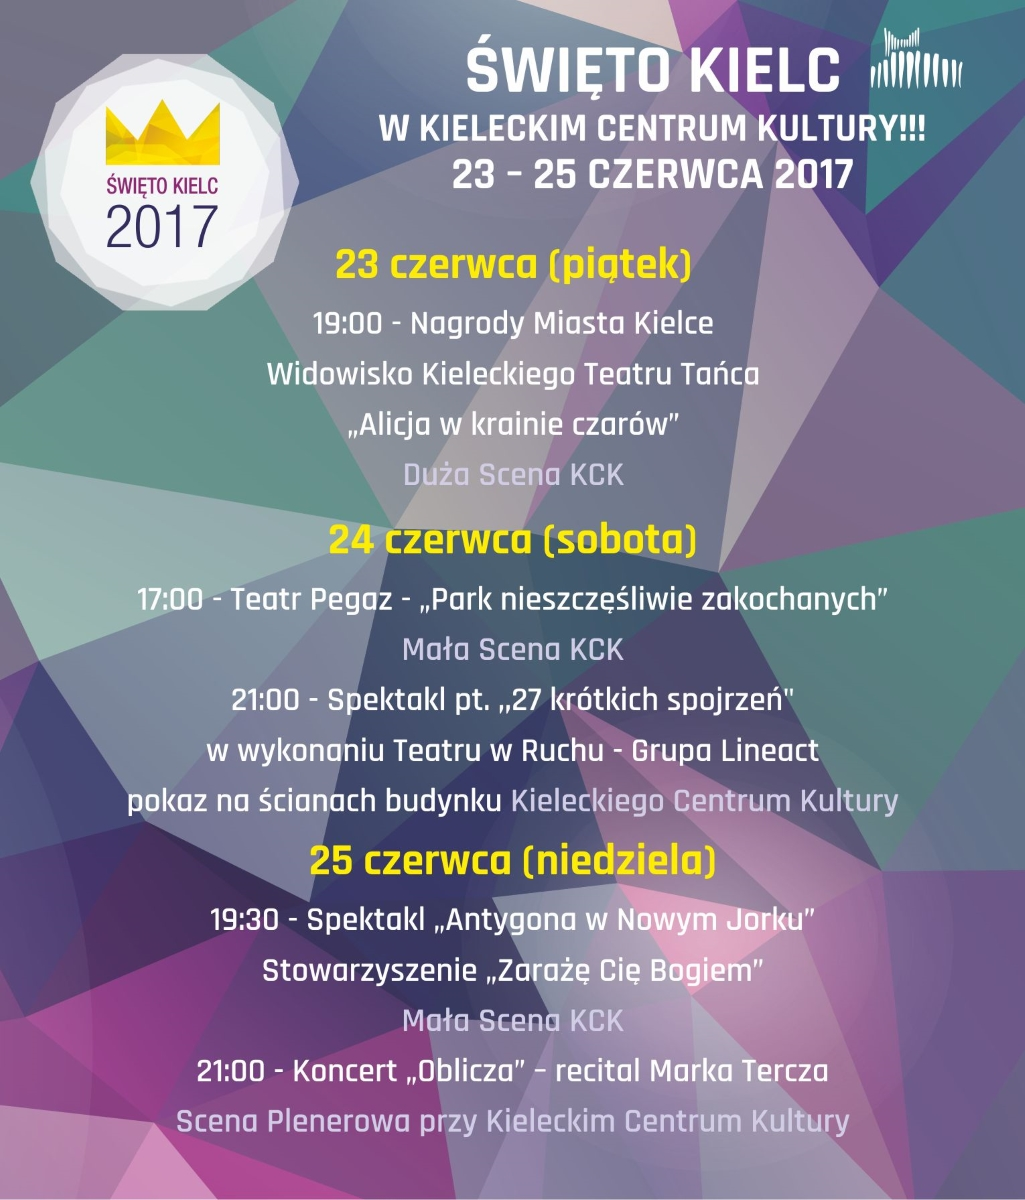 sw_kielc_kck-2017